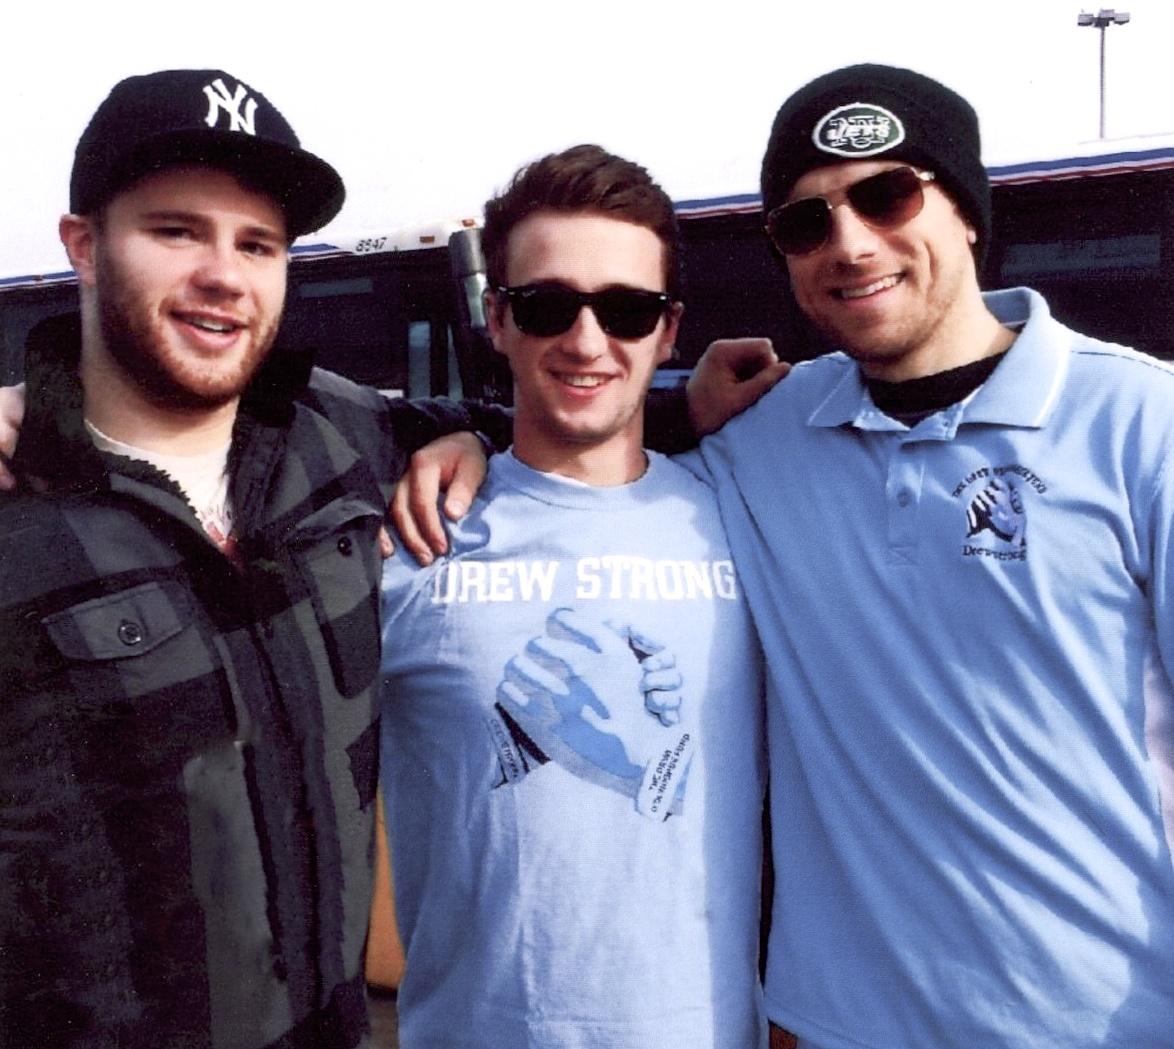 Cousins Liam Kristinnsson, Patrick O'Donoghue (Drew's brother) and Greg Vogel at MetLife Stadium.